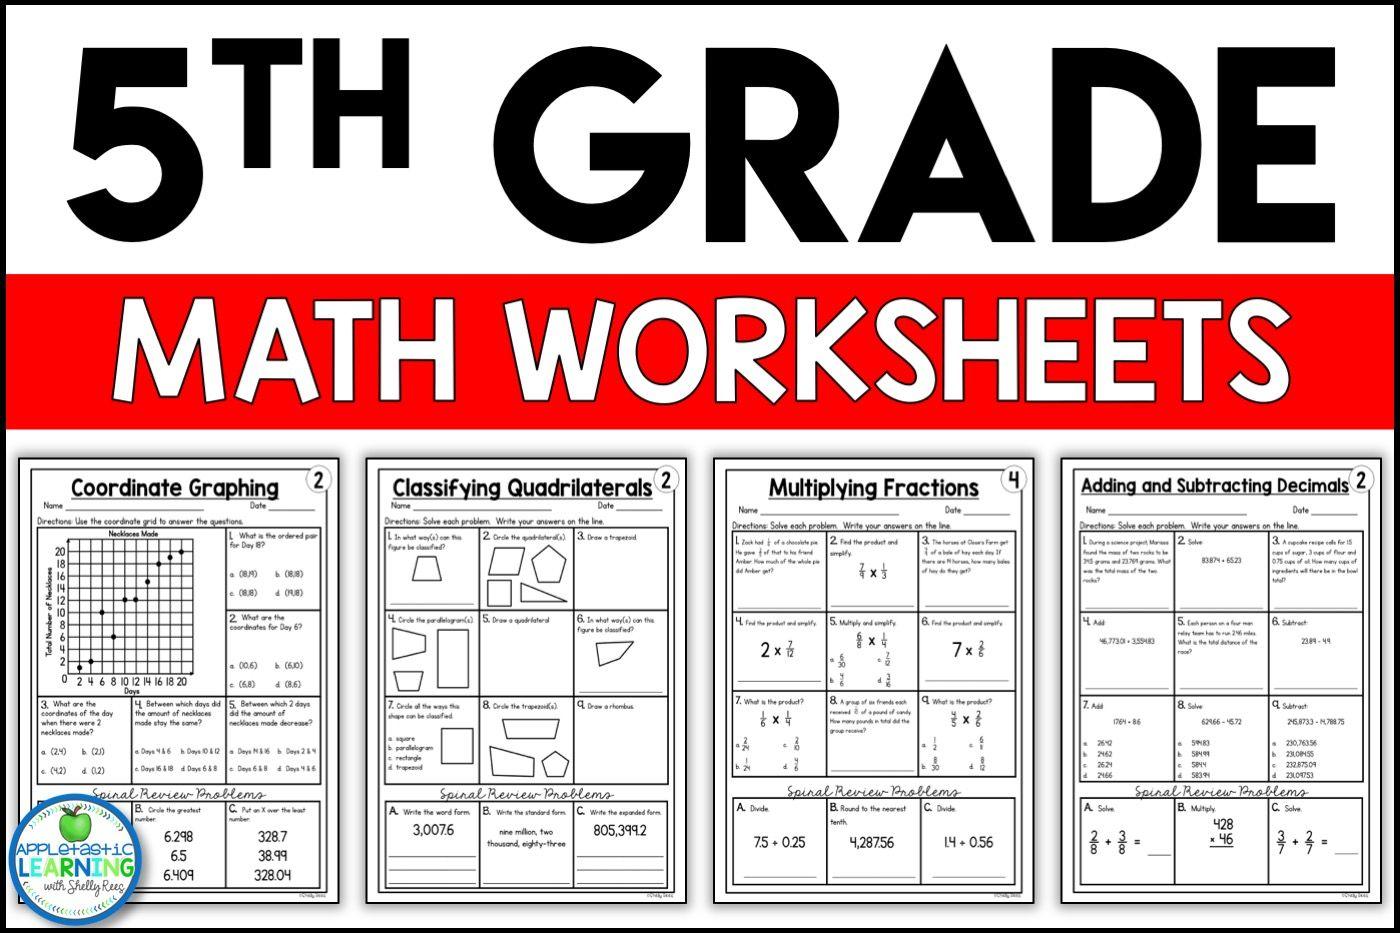 5th Grade Math Worksheets Free And Printable Appletastic Learning 5th Grade Math Fun Math Worksheets 5th Grade Worksheets